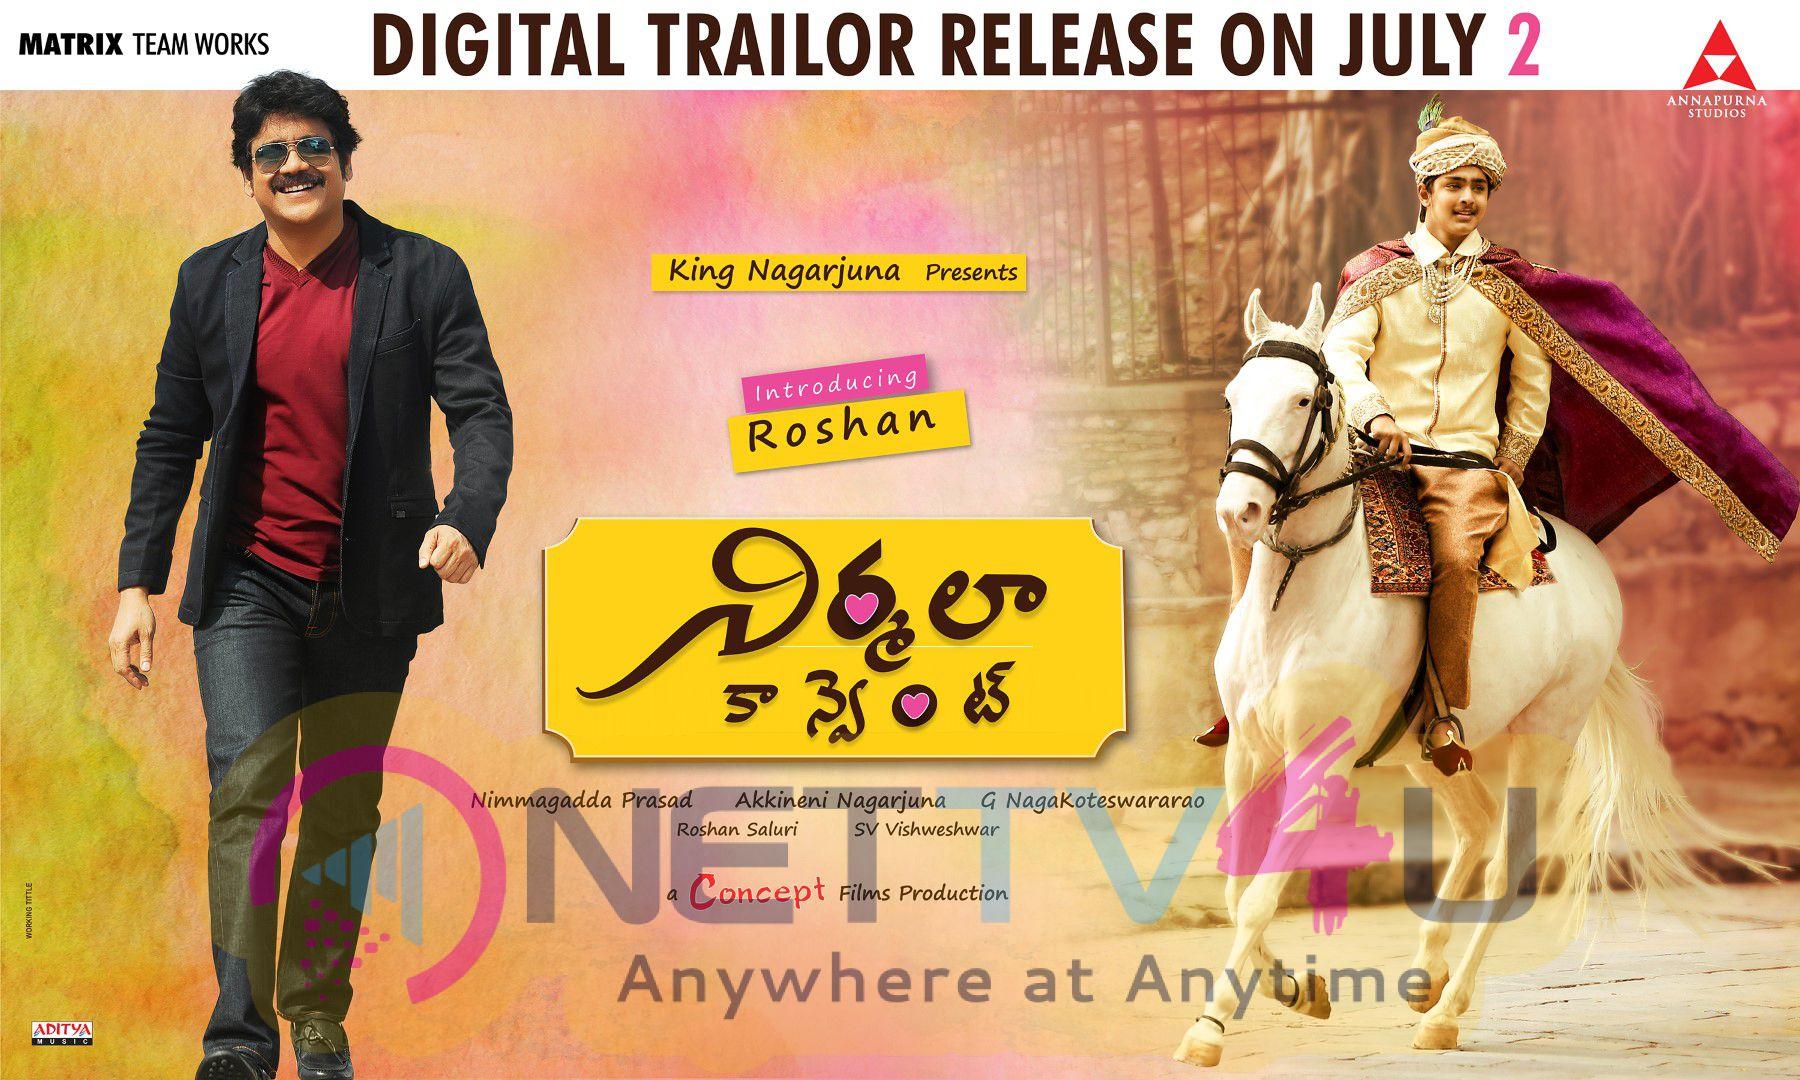 Telugu Movie Nirmala Convent Digital Trailer Release On July 2 Posters